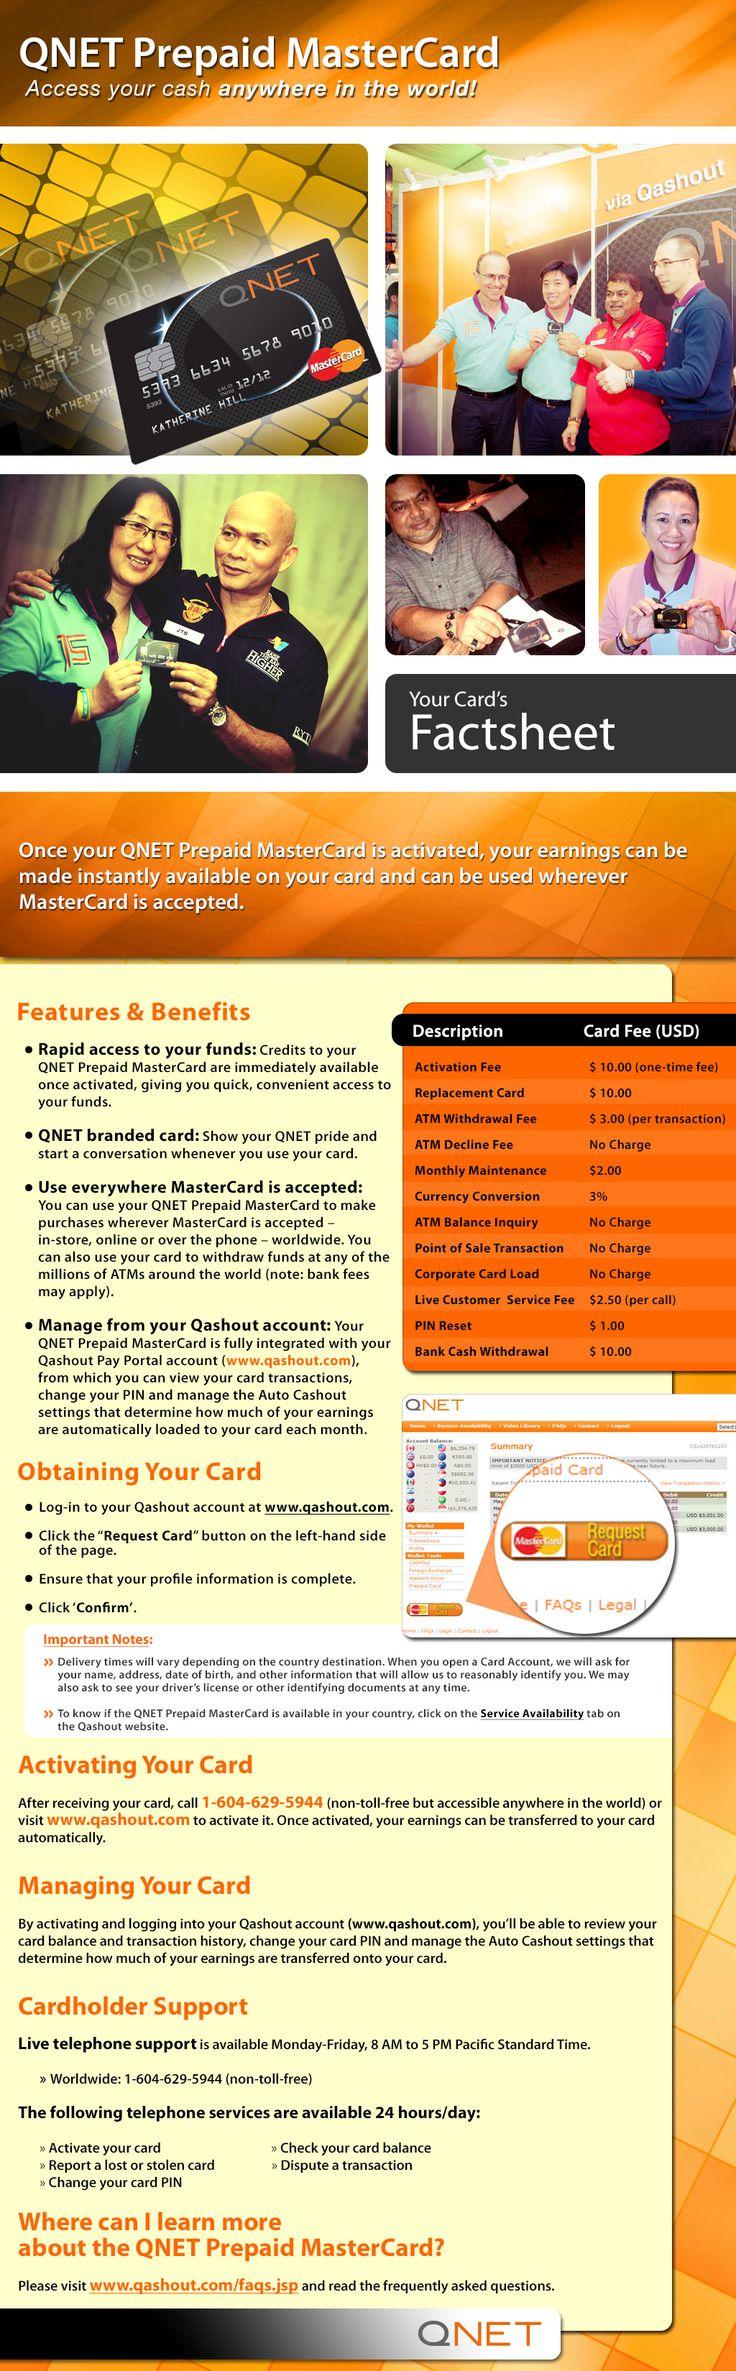 ef71c92725e764b53b6fb1e70e6f50ac visa card credit check